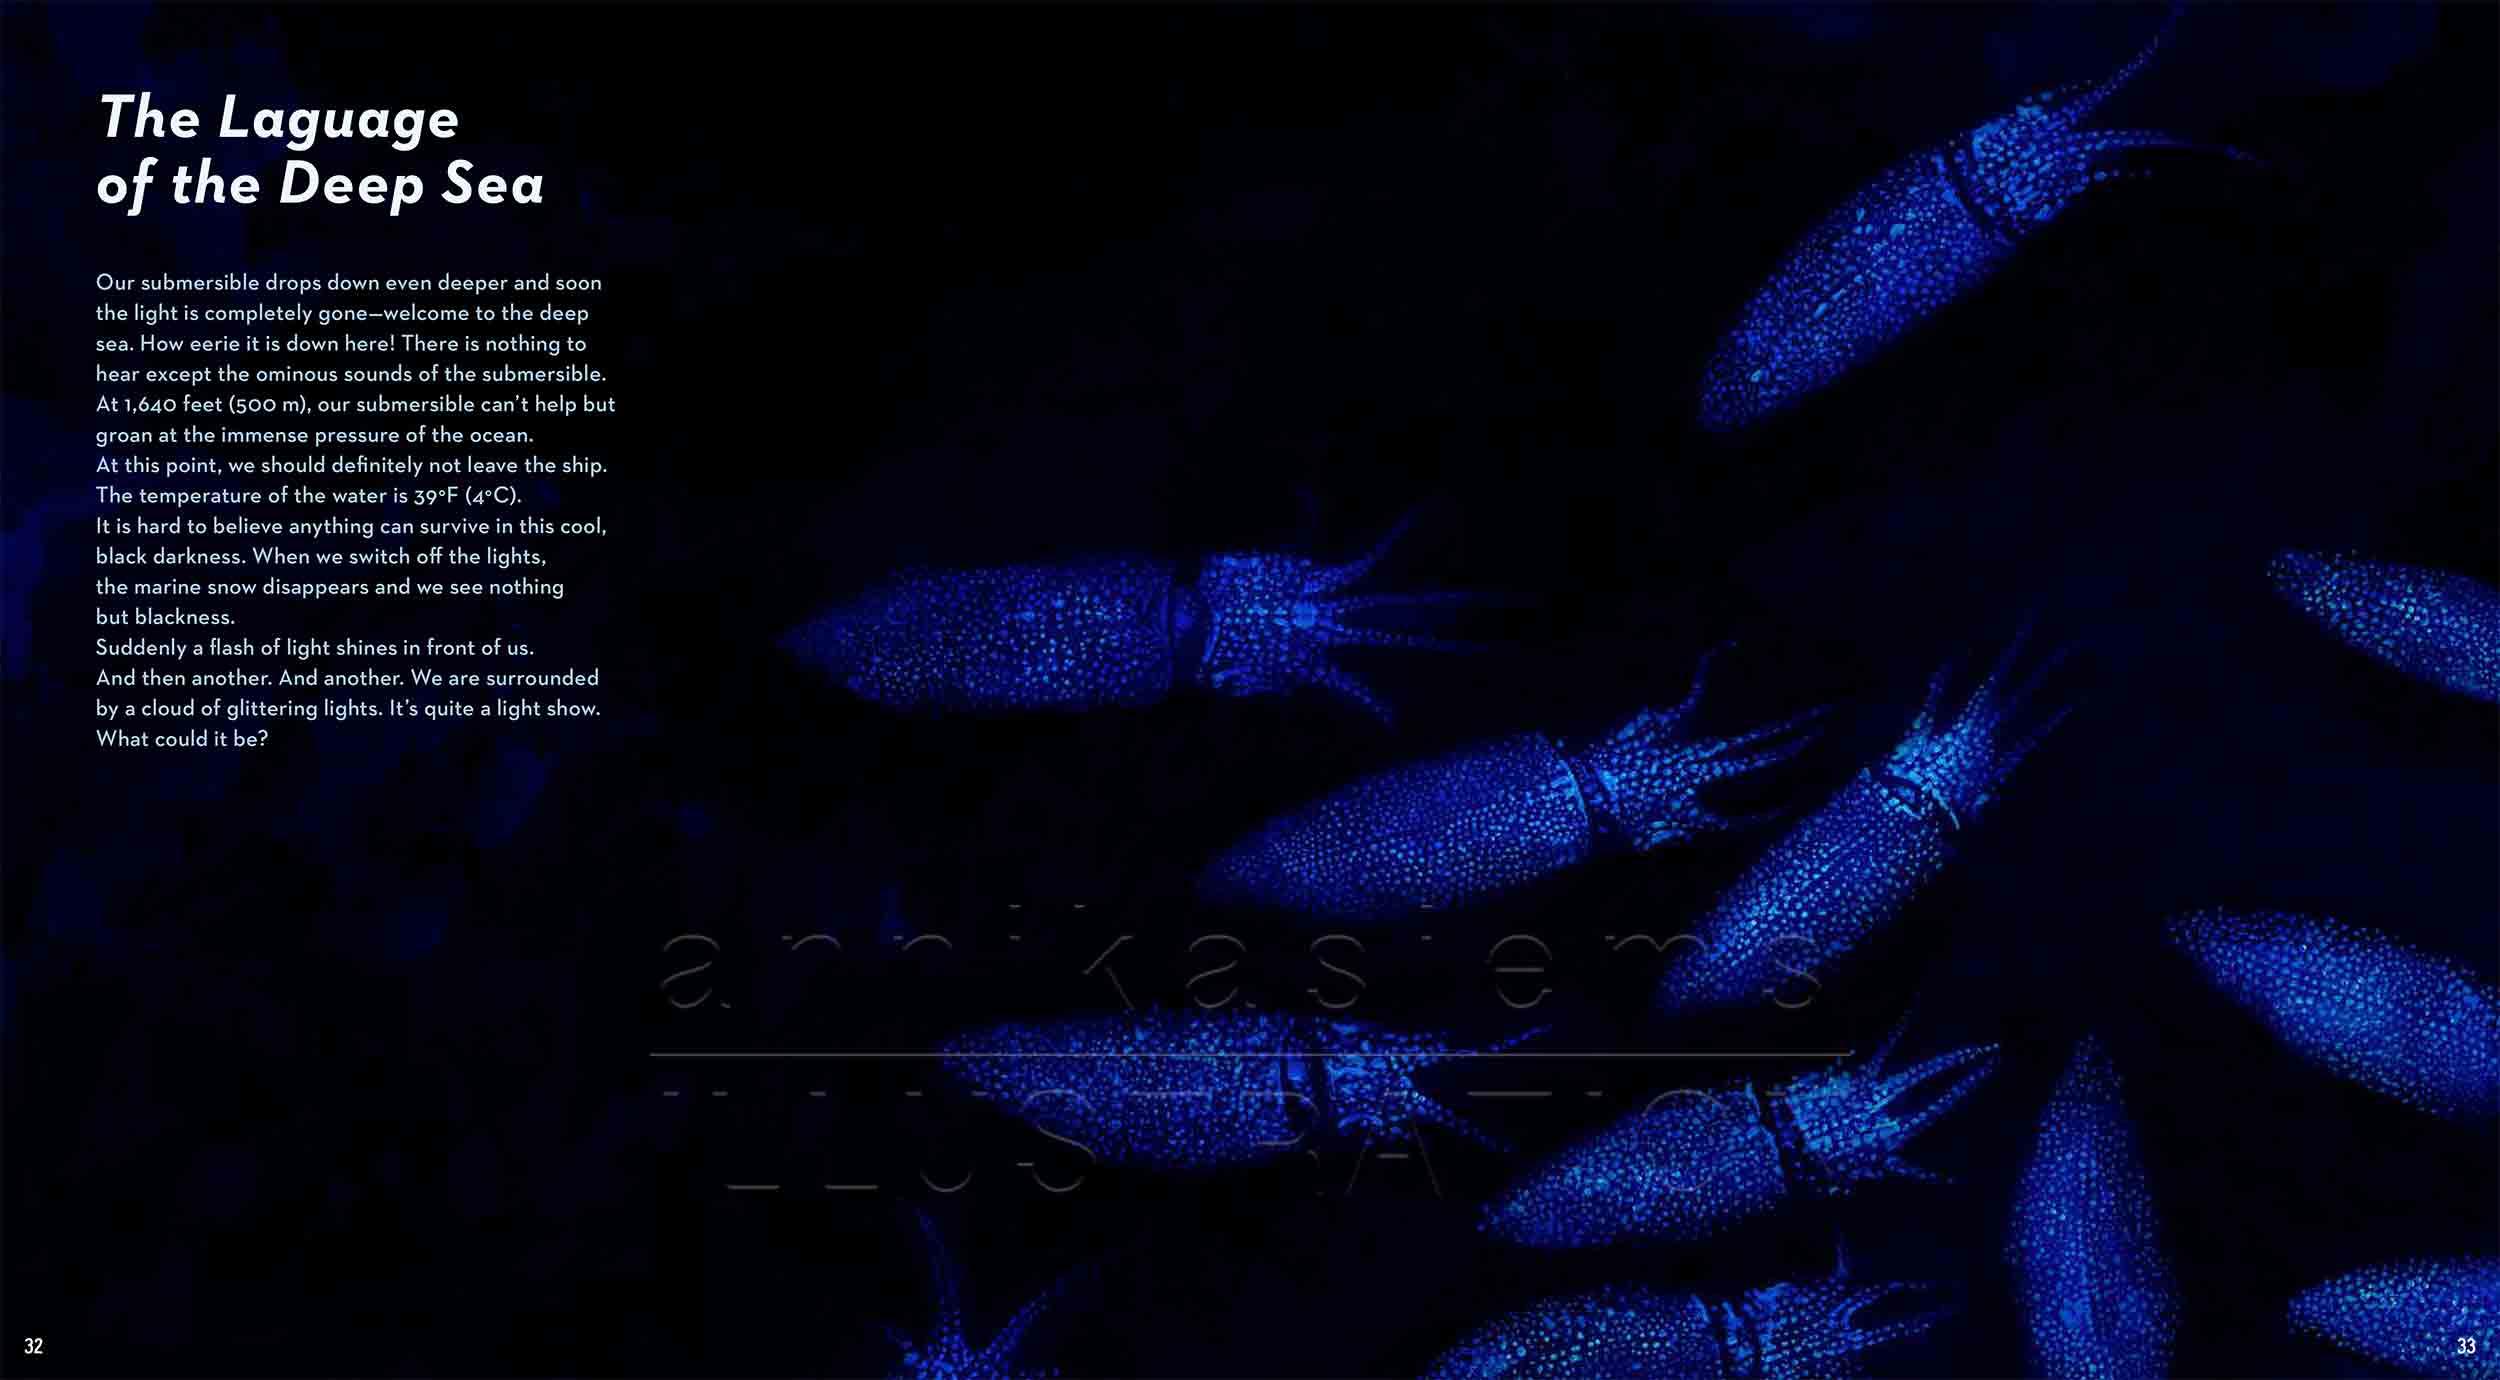 32-33-Leuchtkalmar-fireflysquid-fish-deep-sea-Englisch-submersible-©annikasiems-plankton_deepsea-zooplankton.jpg